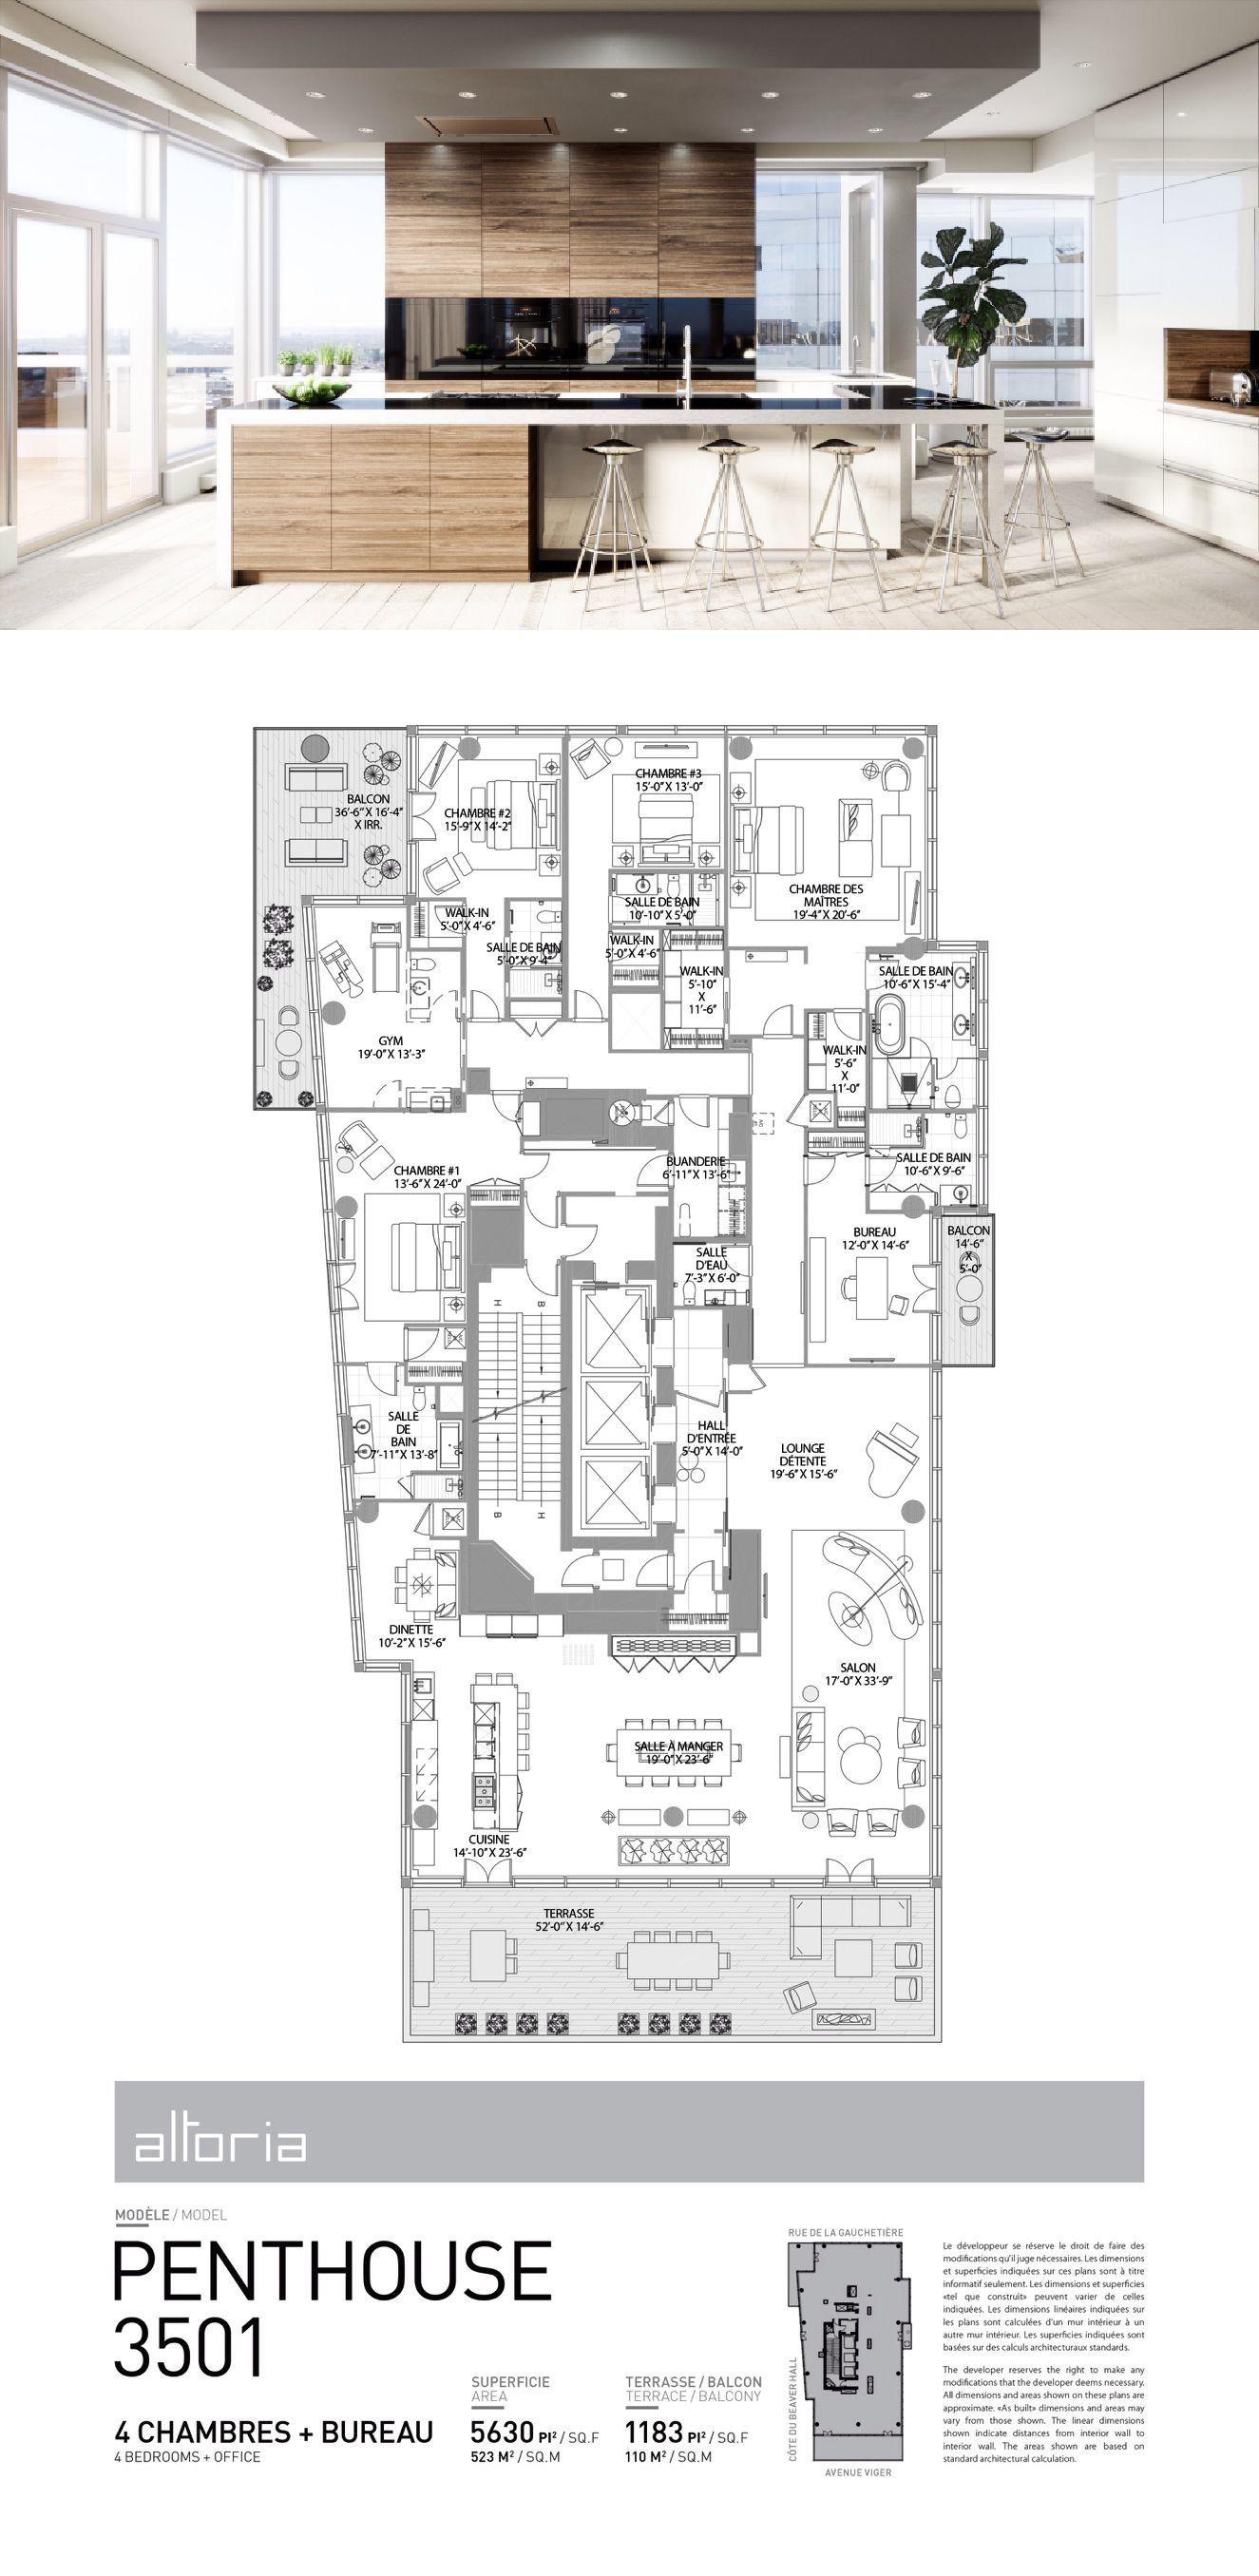 Plans 35th Floor Altoria Downtown Montreal Condos Condo Floor Plans Apartment Plans Floor Plans